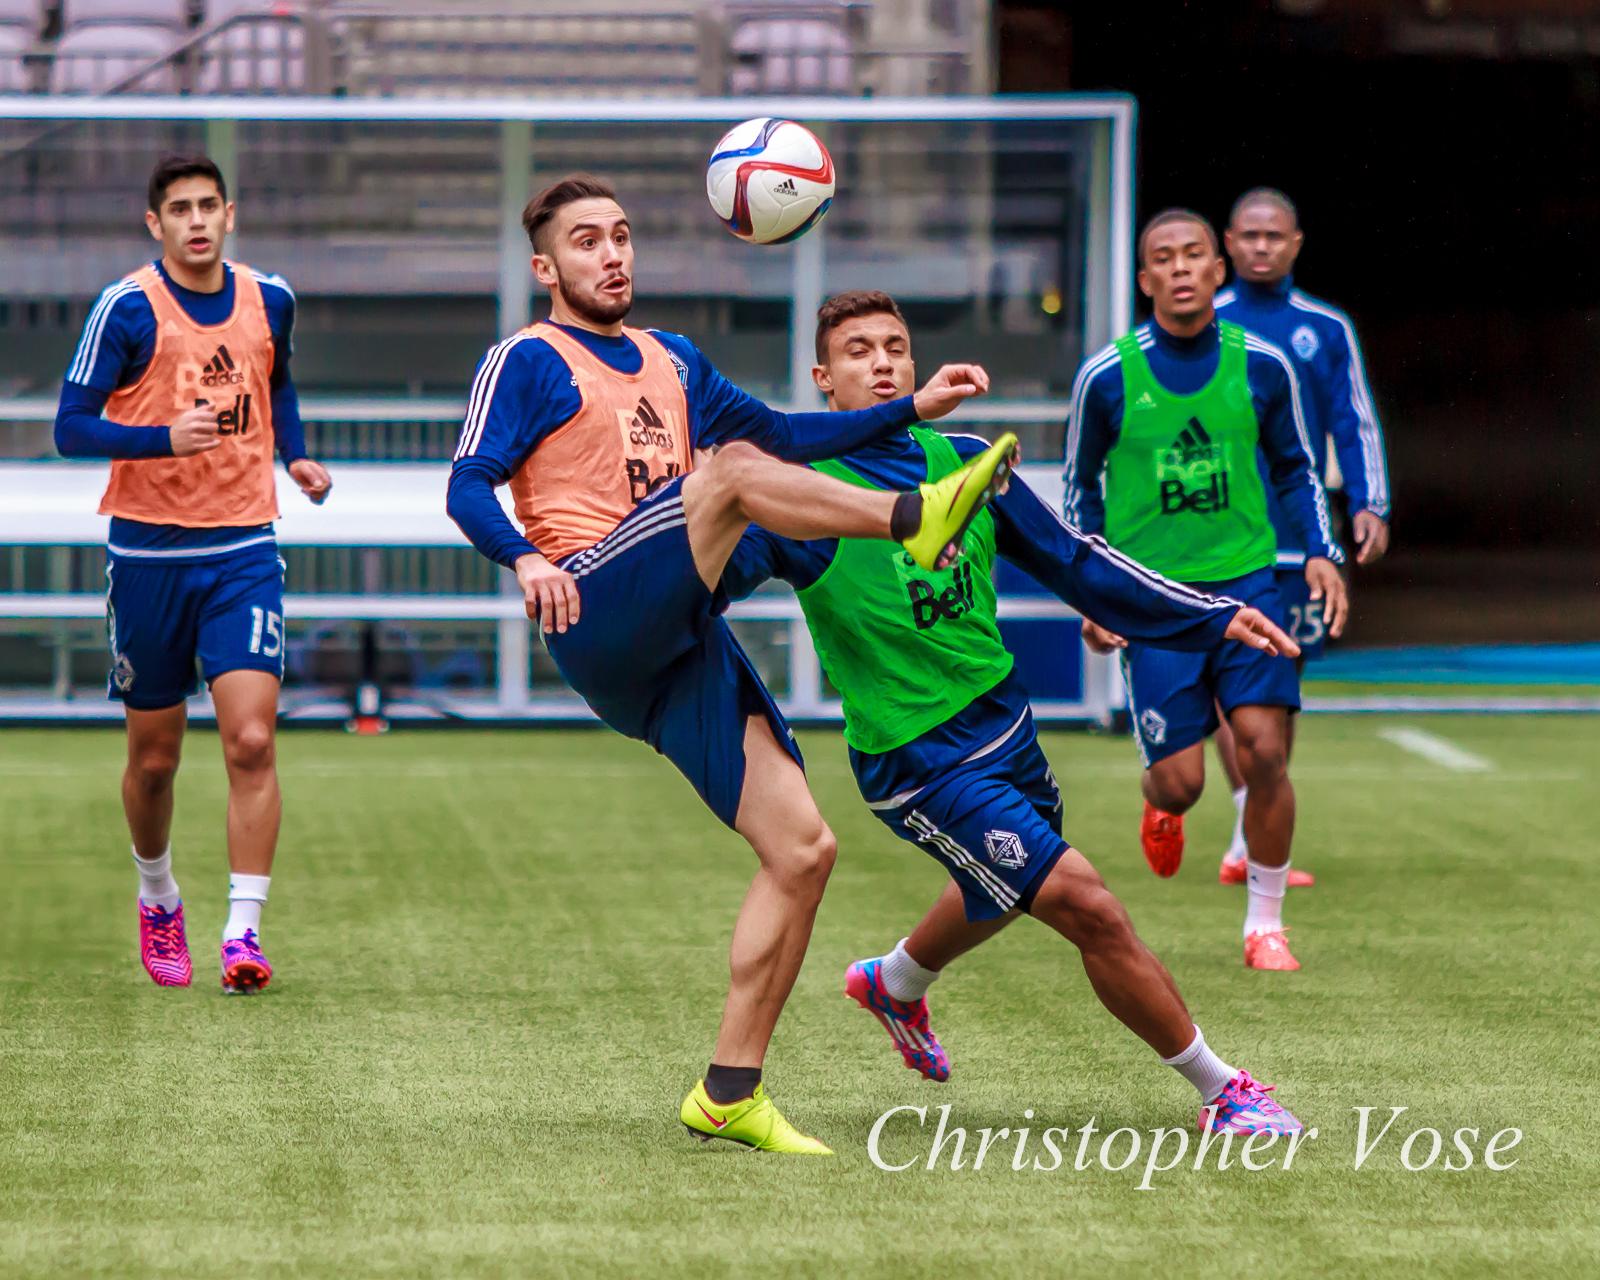 2015-04-01 Pedro Morales and Kianz Froese.jpg